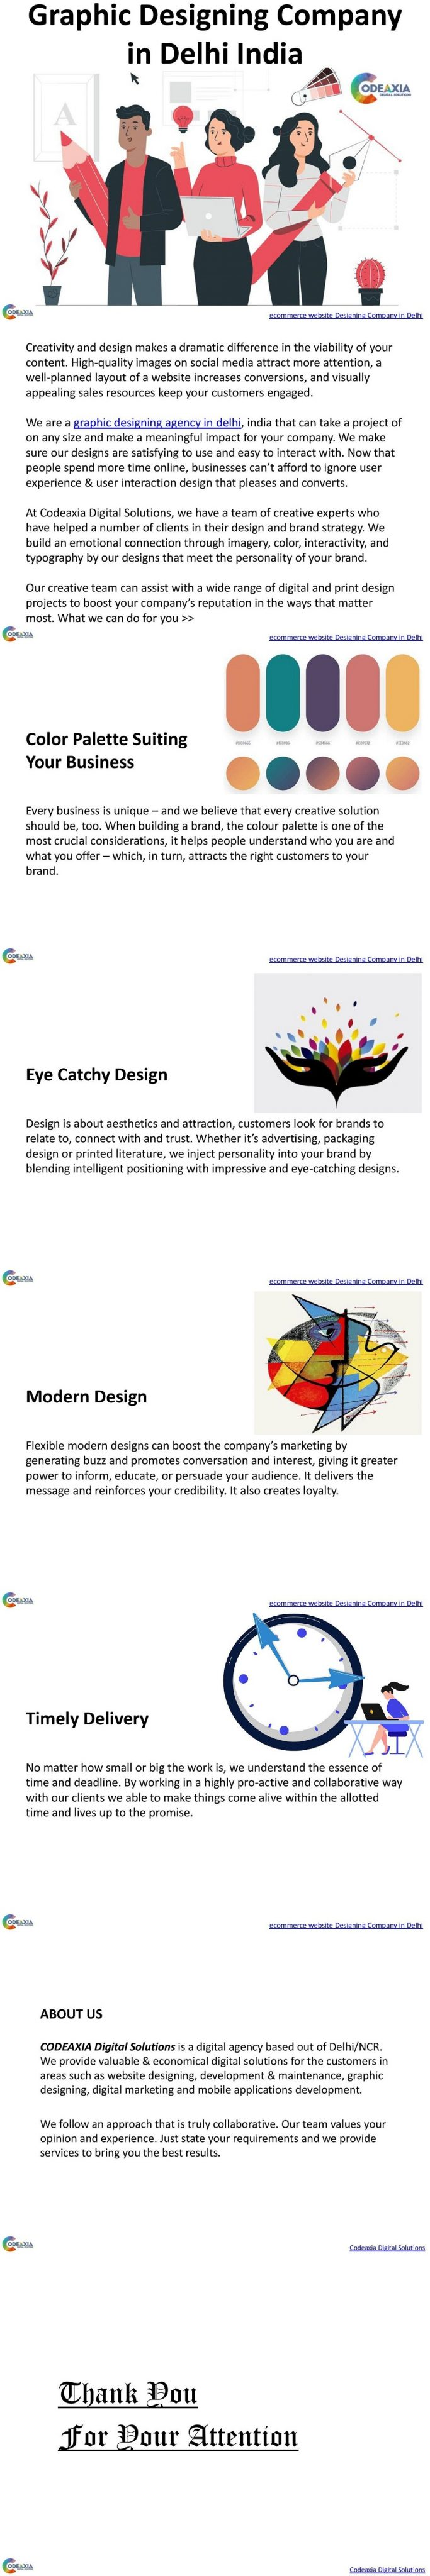 Graphic Designing Company in Delhi, India